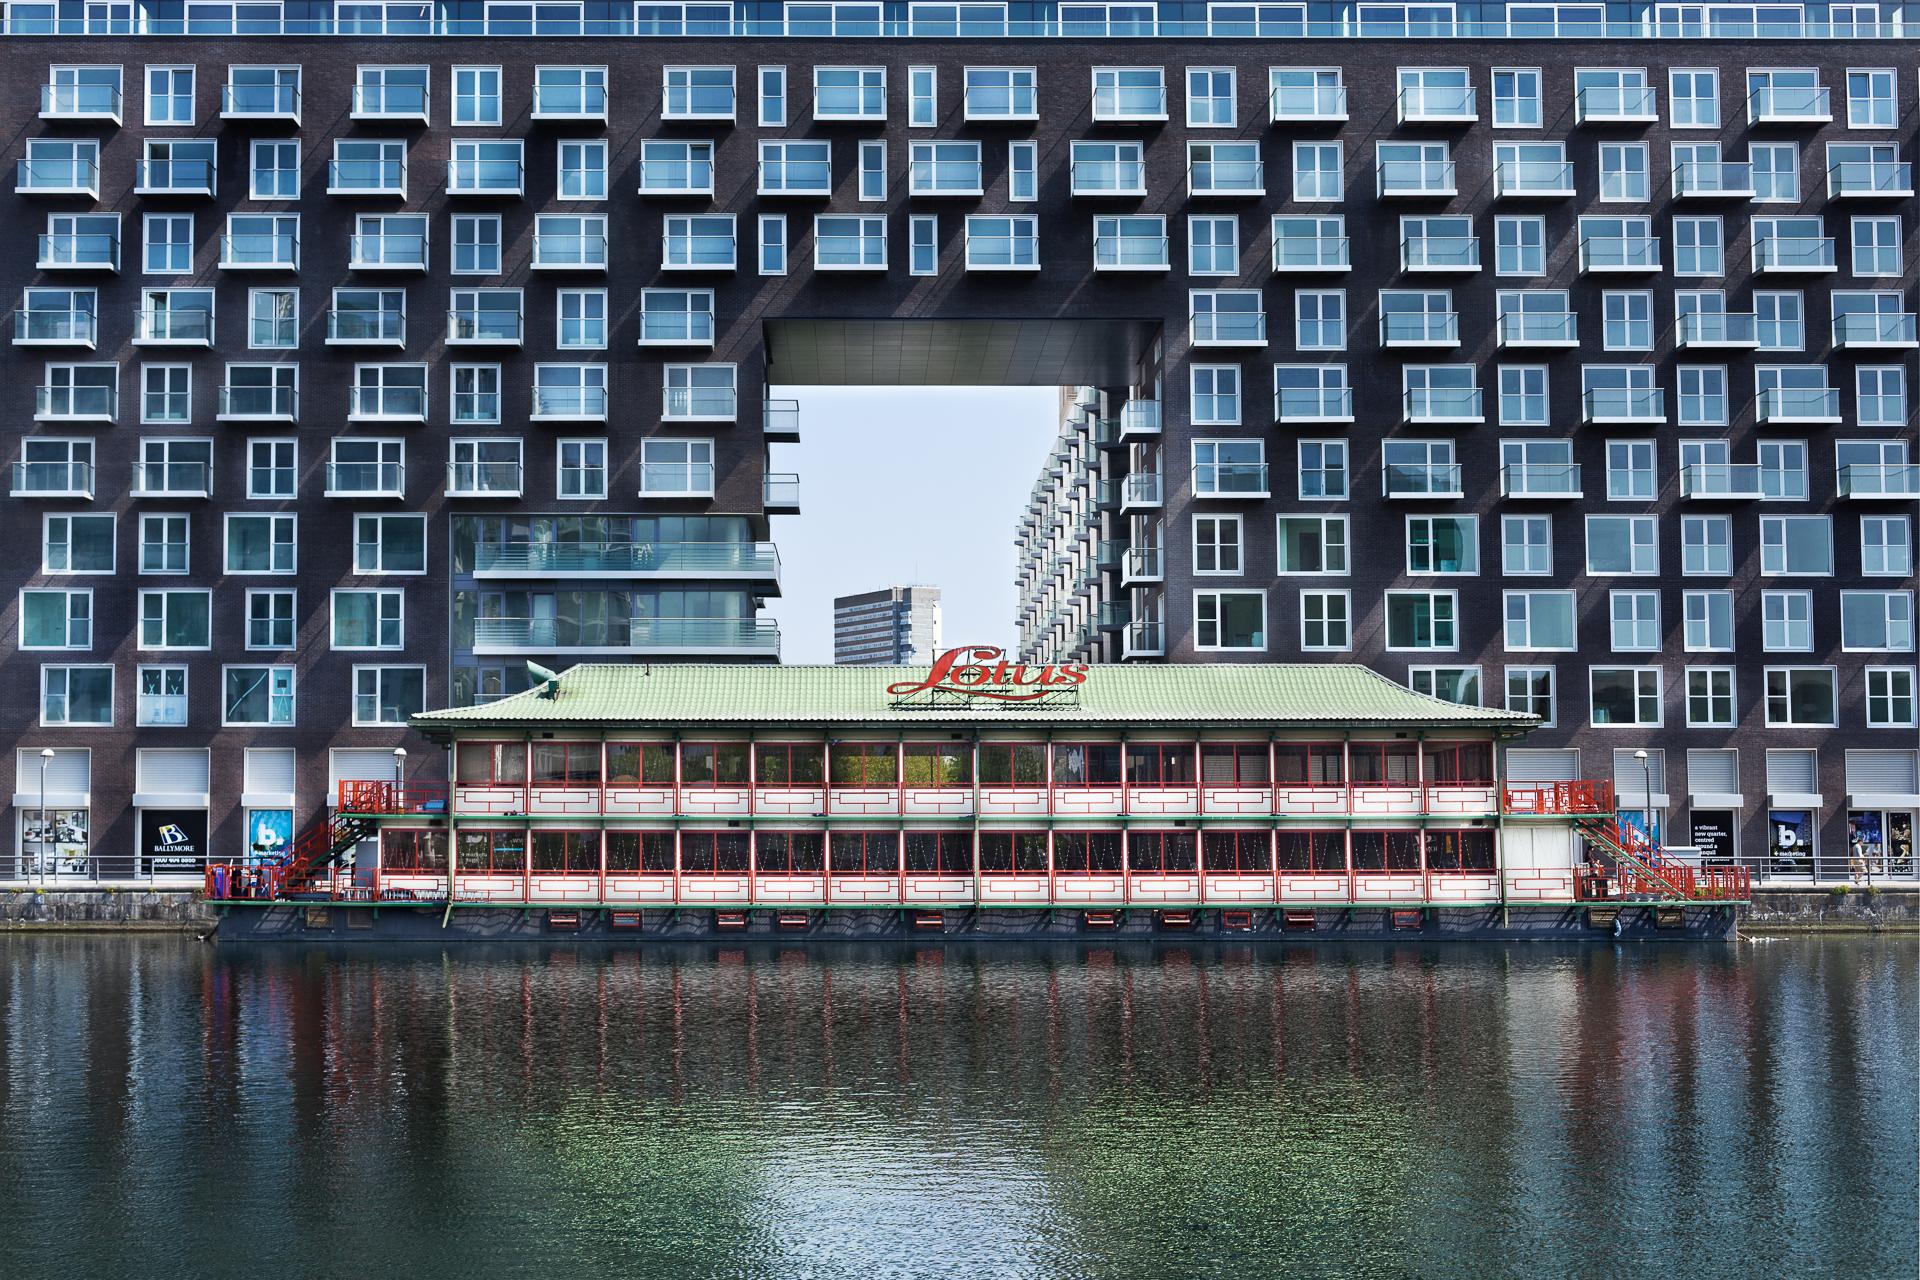 canary-wharf-london